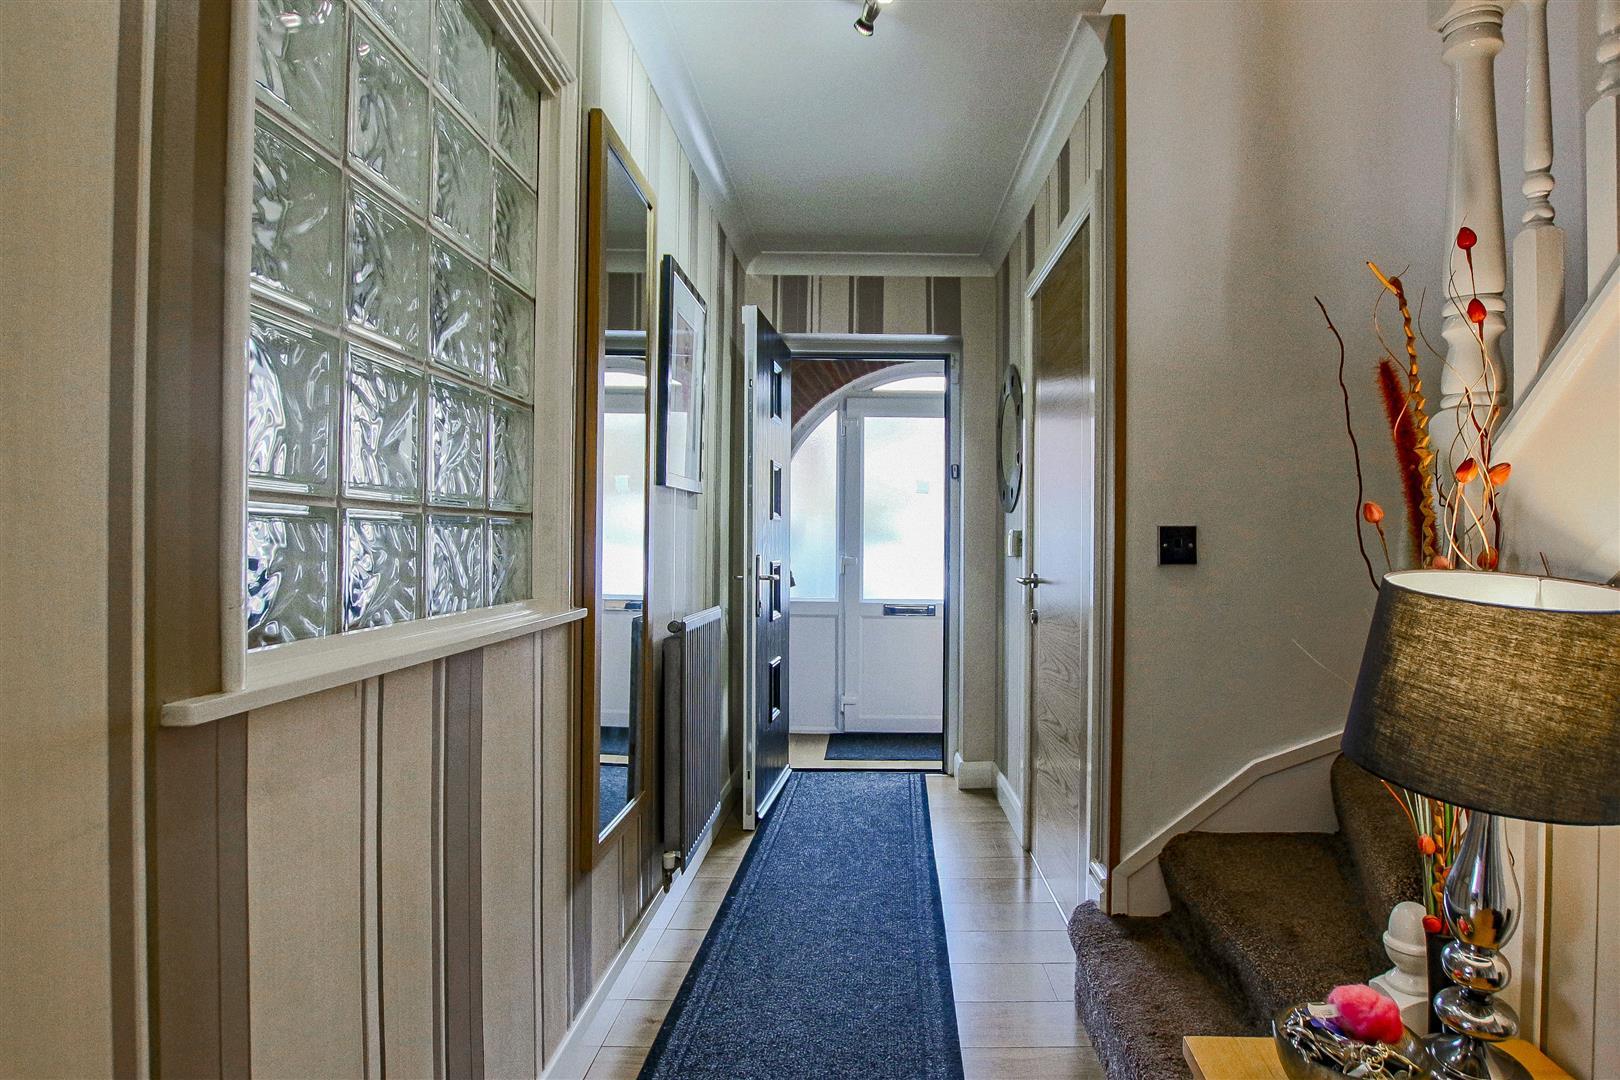 4 Bedroom Detached House For Sale - redwing31764.JPG